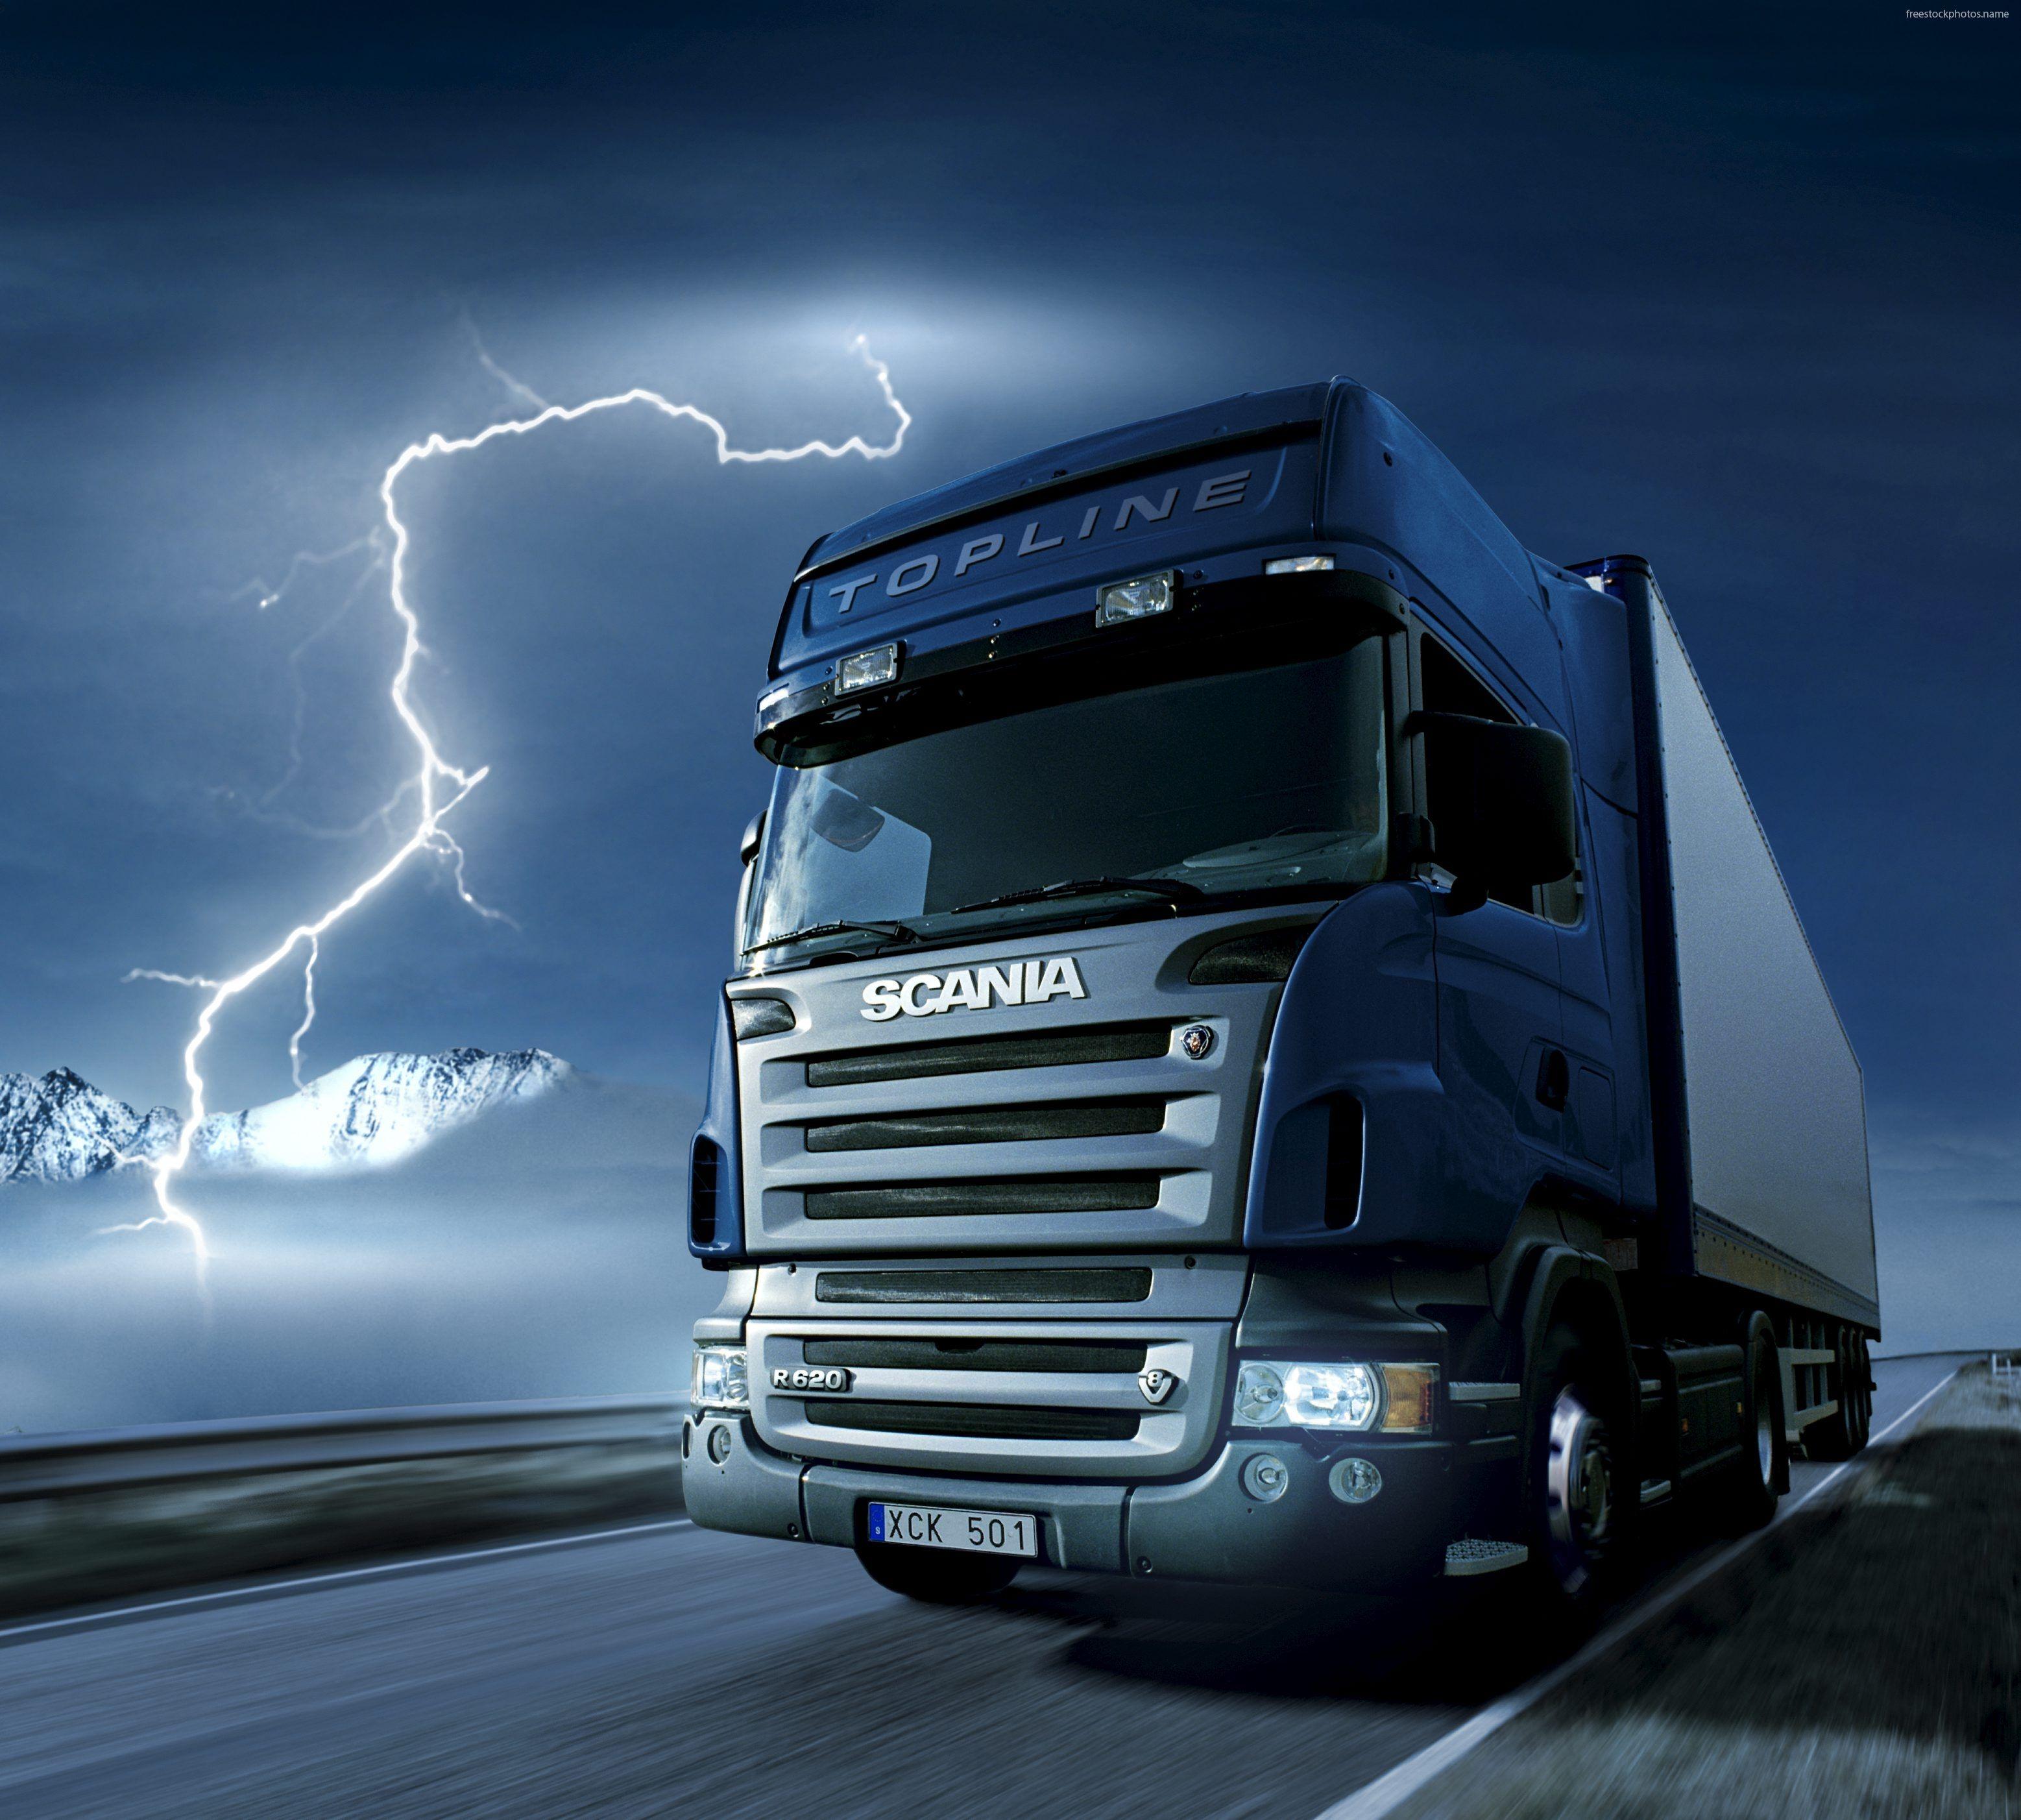 HD Futuristic Truck Wallpapers Pickup Truck Free HD Wallpapers